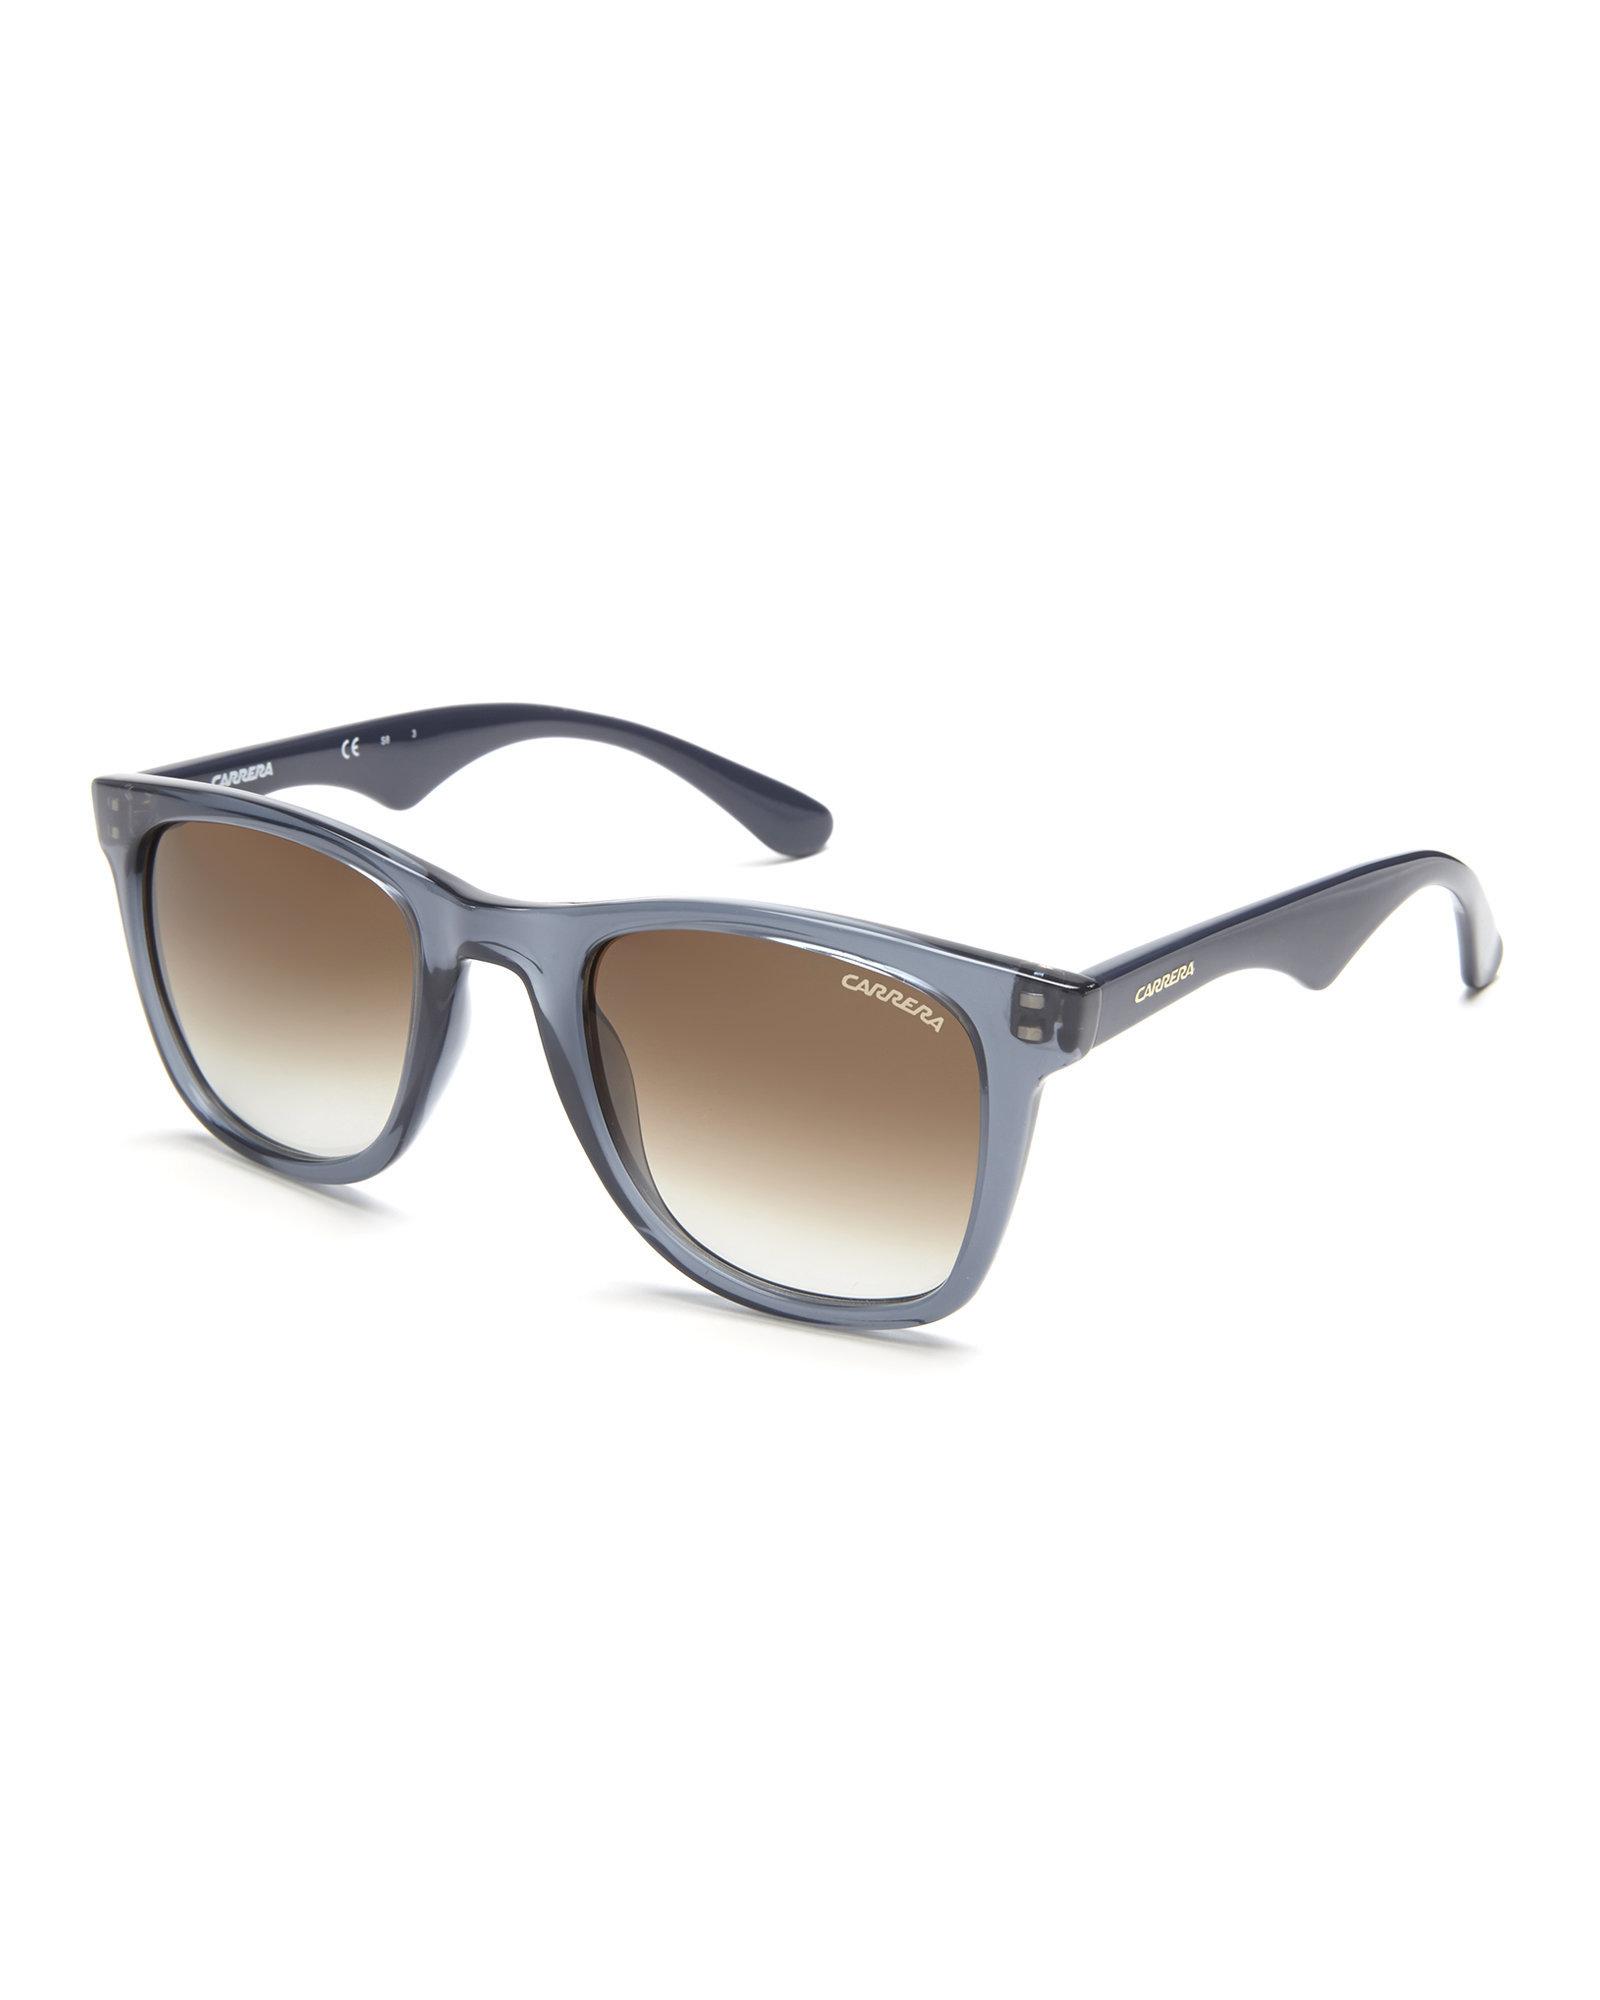 1abe246f22 Lyst - Carrera 6000 L S Blue Wayfarer Sunglasses in Blue for Men